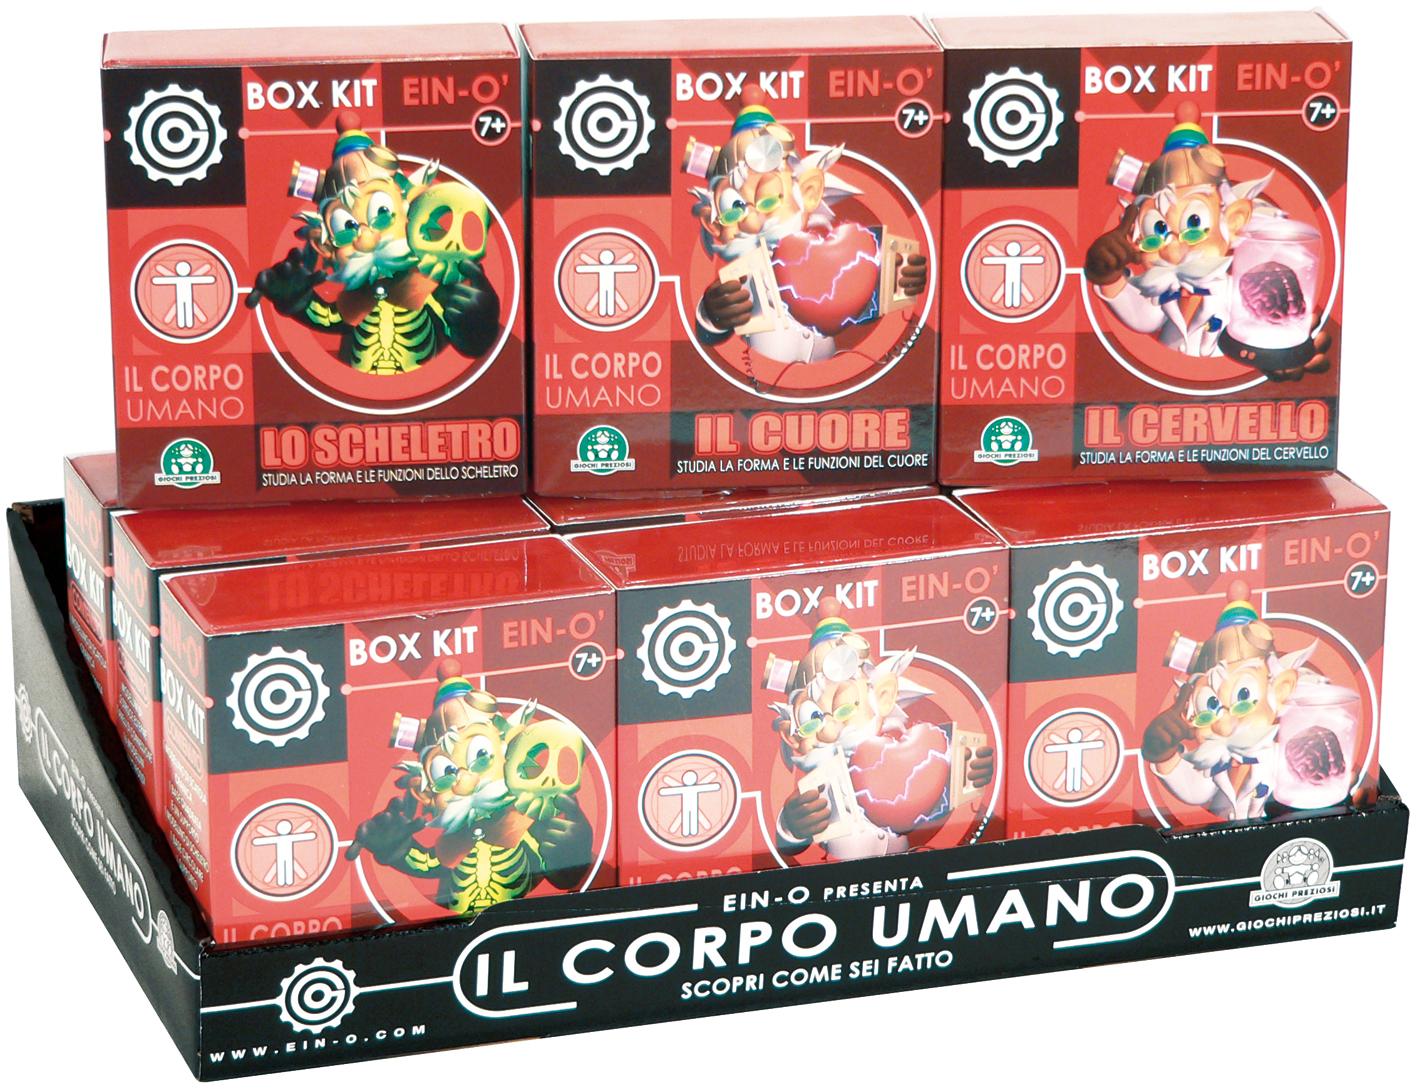 CORPO UMANO BOX KITS